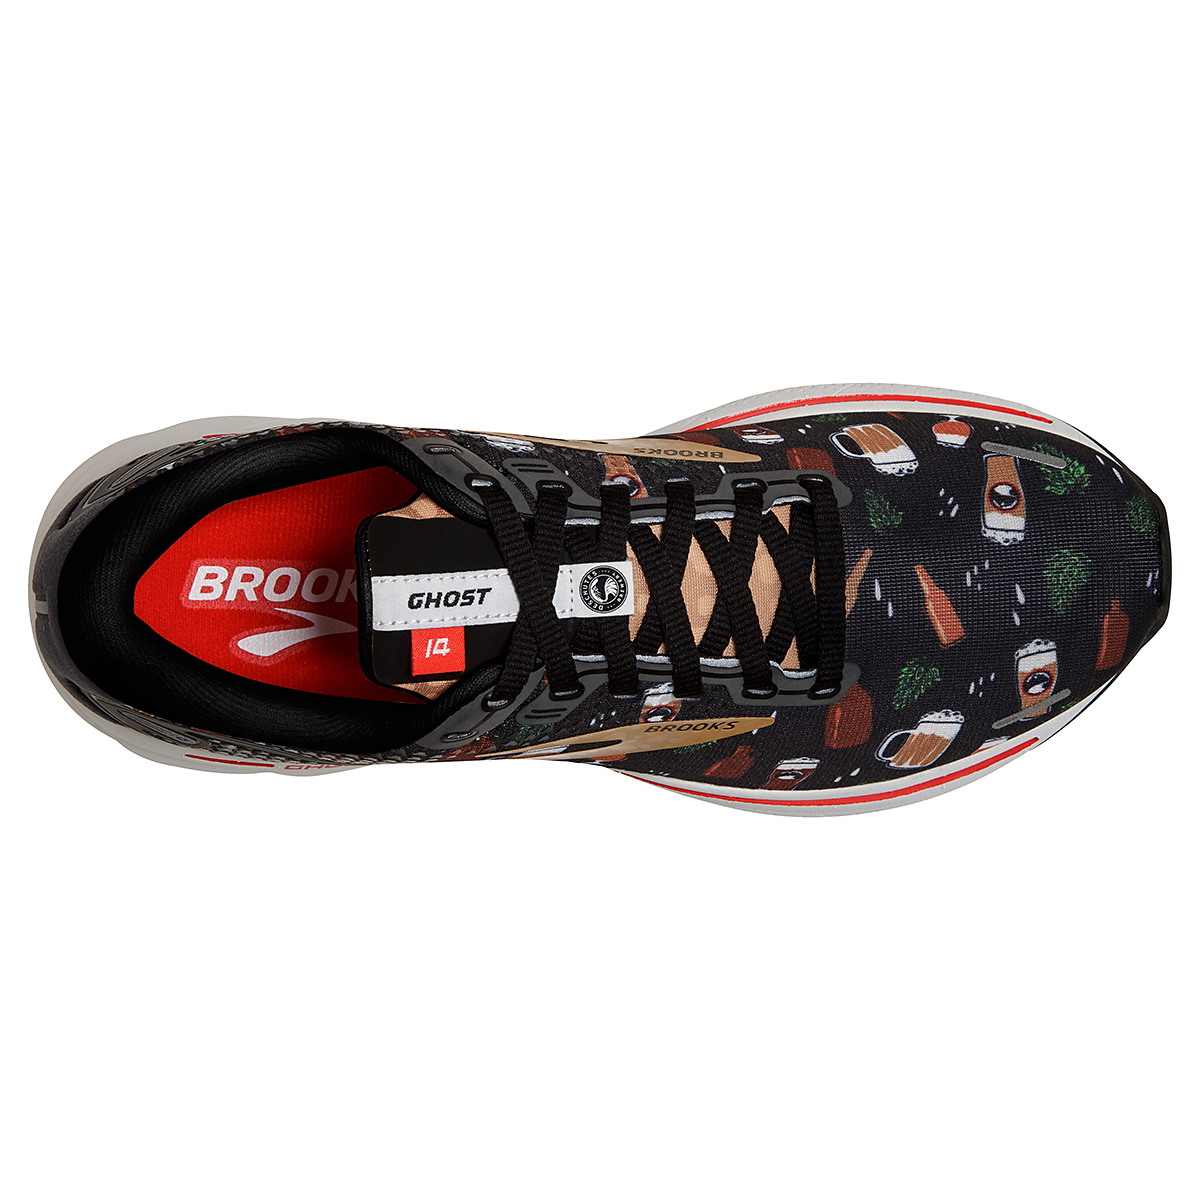 Women's Brooks Ghost 14 Running Shoe - Color: Run Hoppy - Size: 5 - Width: Regular, Run Hoppy, large, image 5